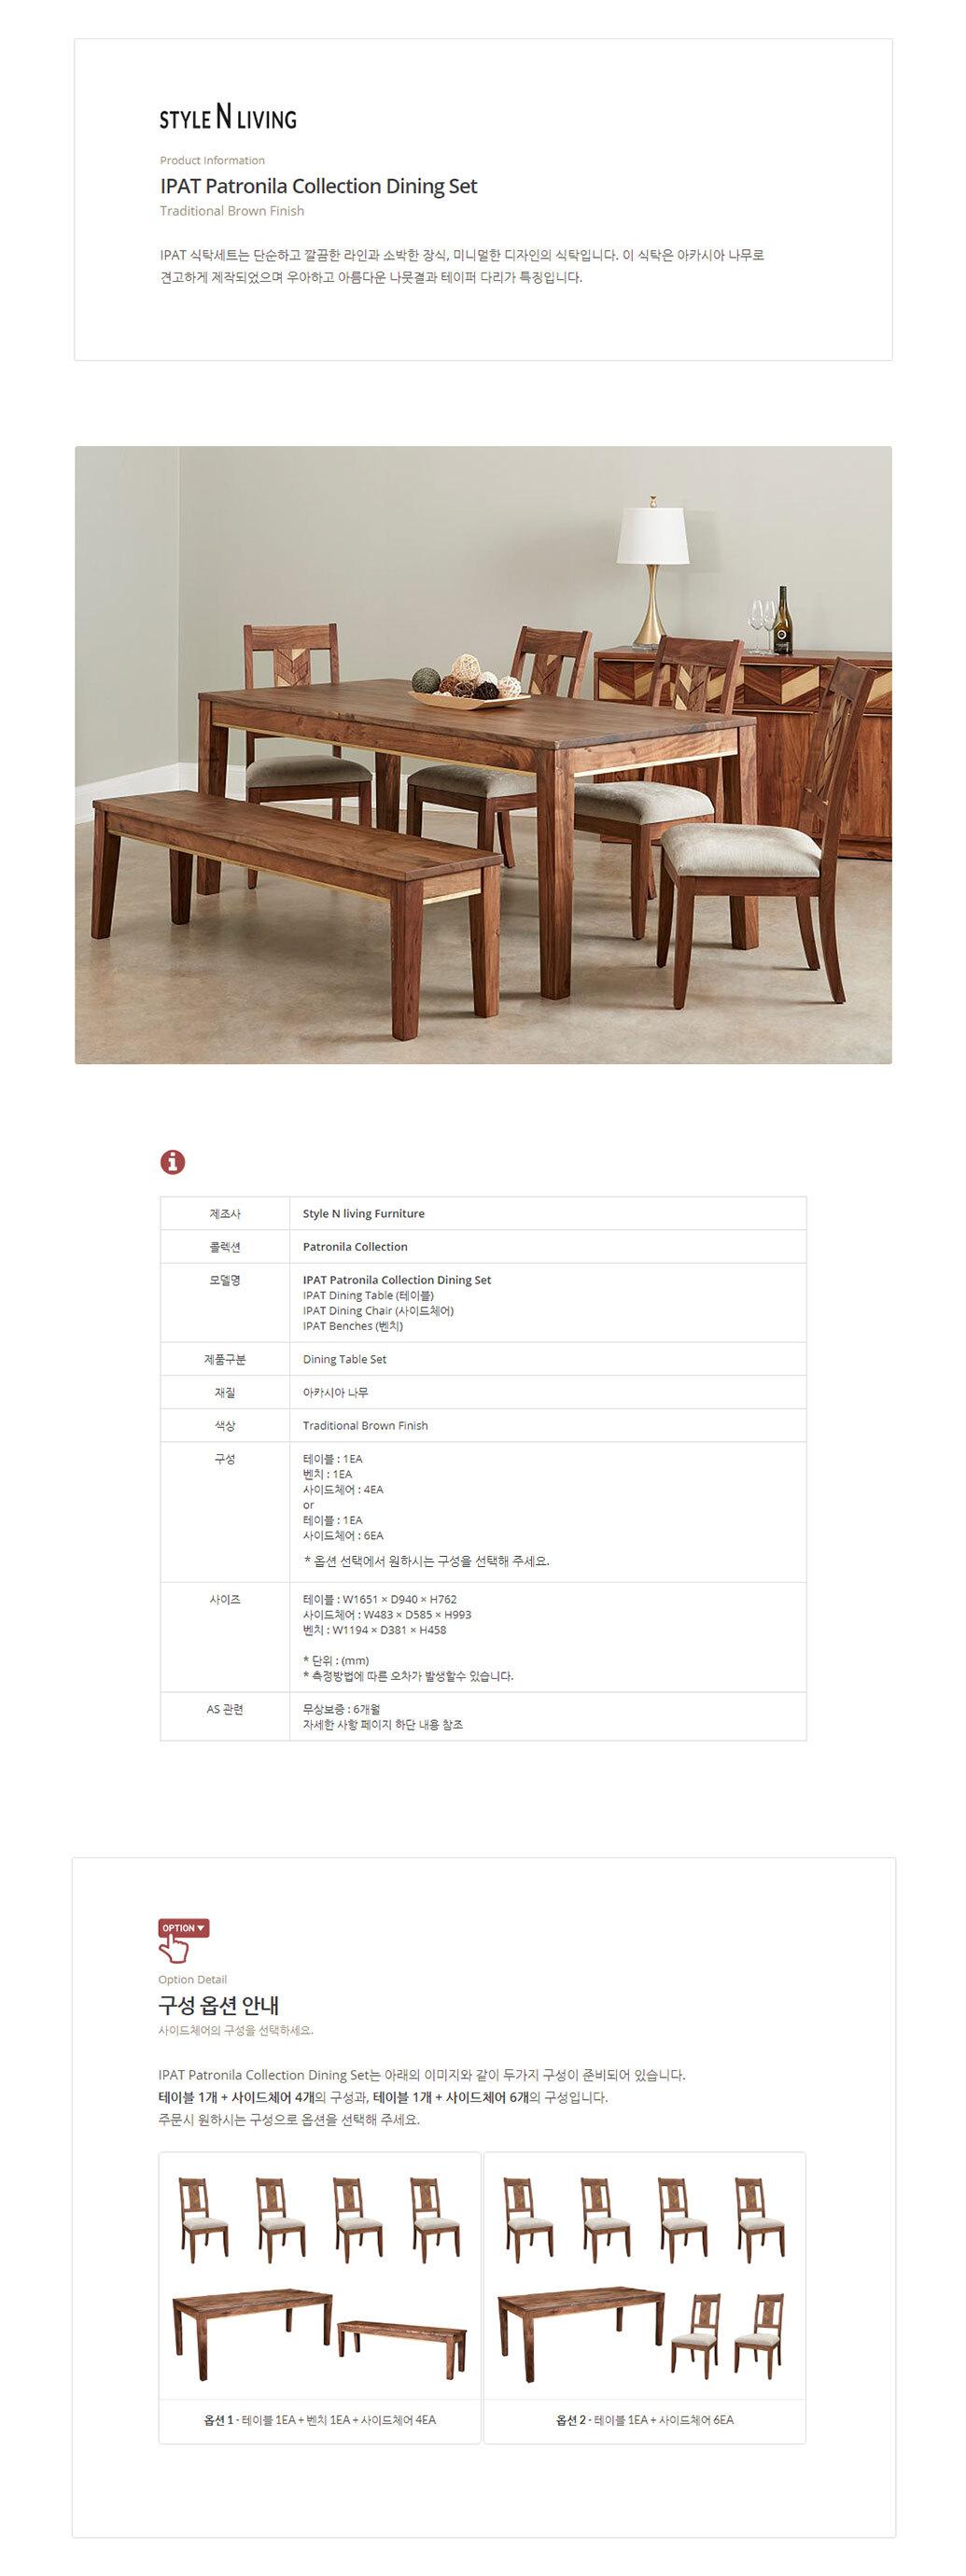 ipat_patronila_table_01.jpg